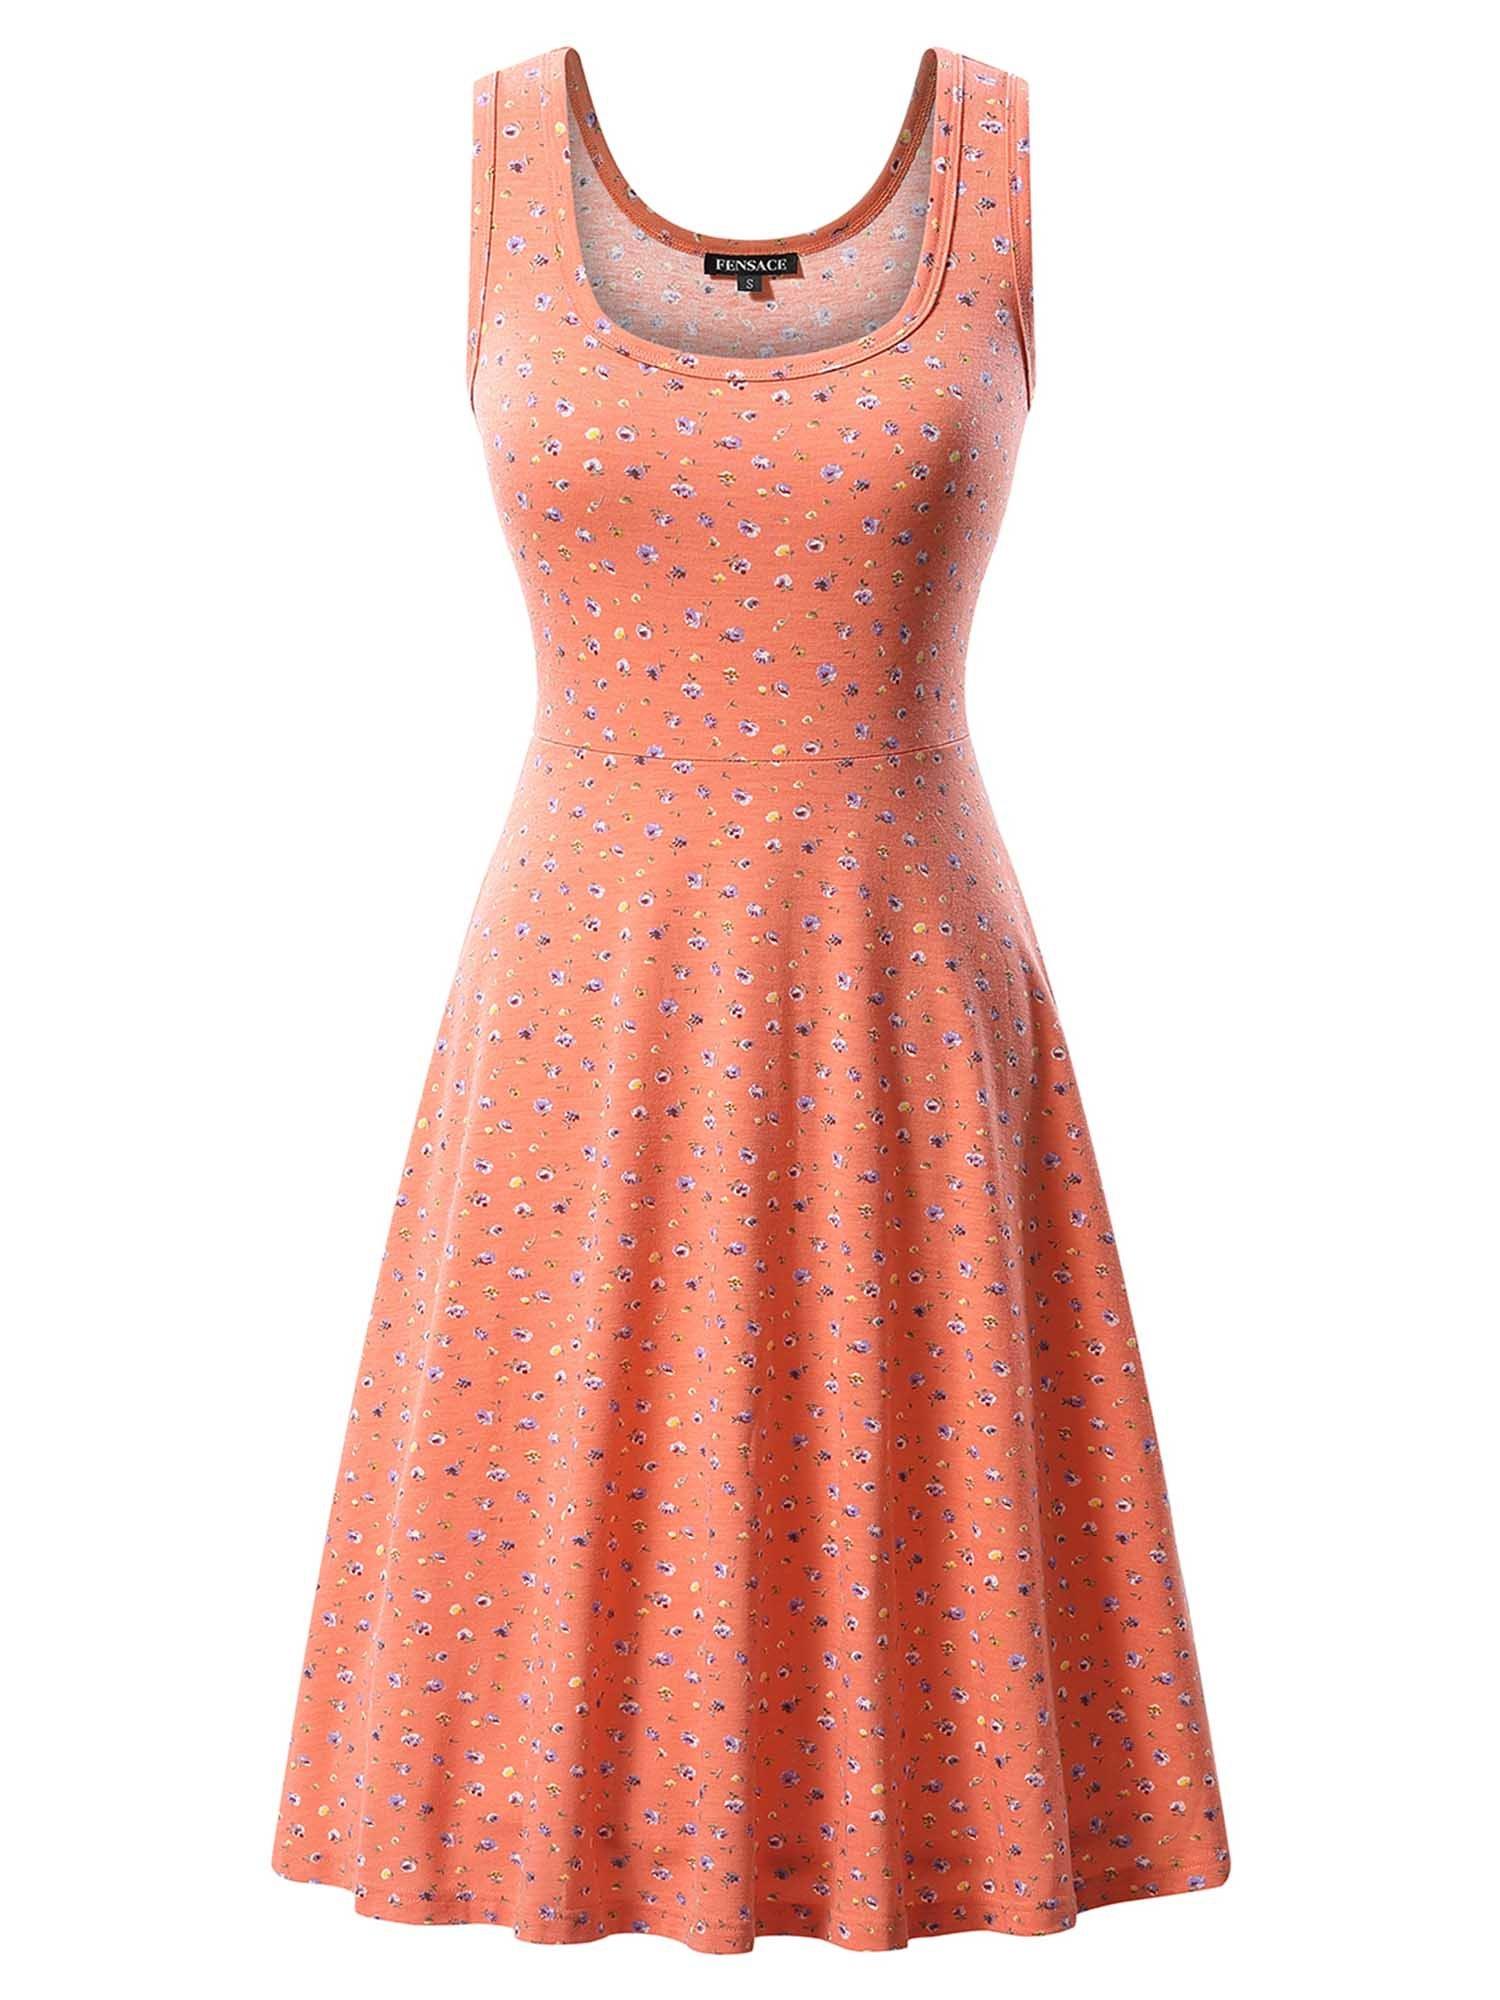 FENSACE Womens Sleeveless Scoop Neck Summer Beach Midi A Line Tank Dress, 17030-19, Medium